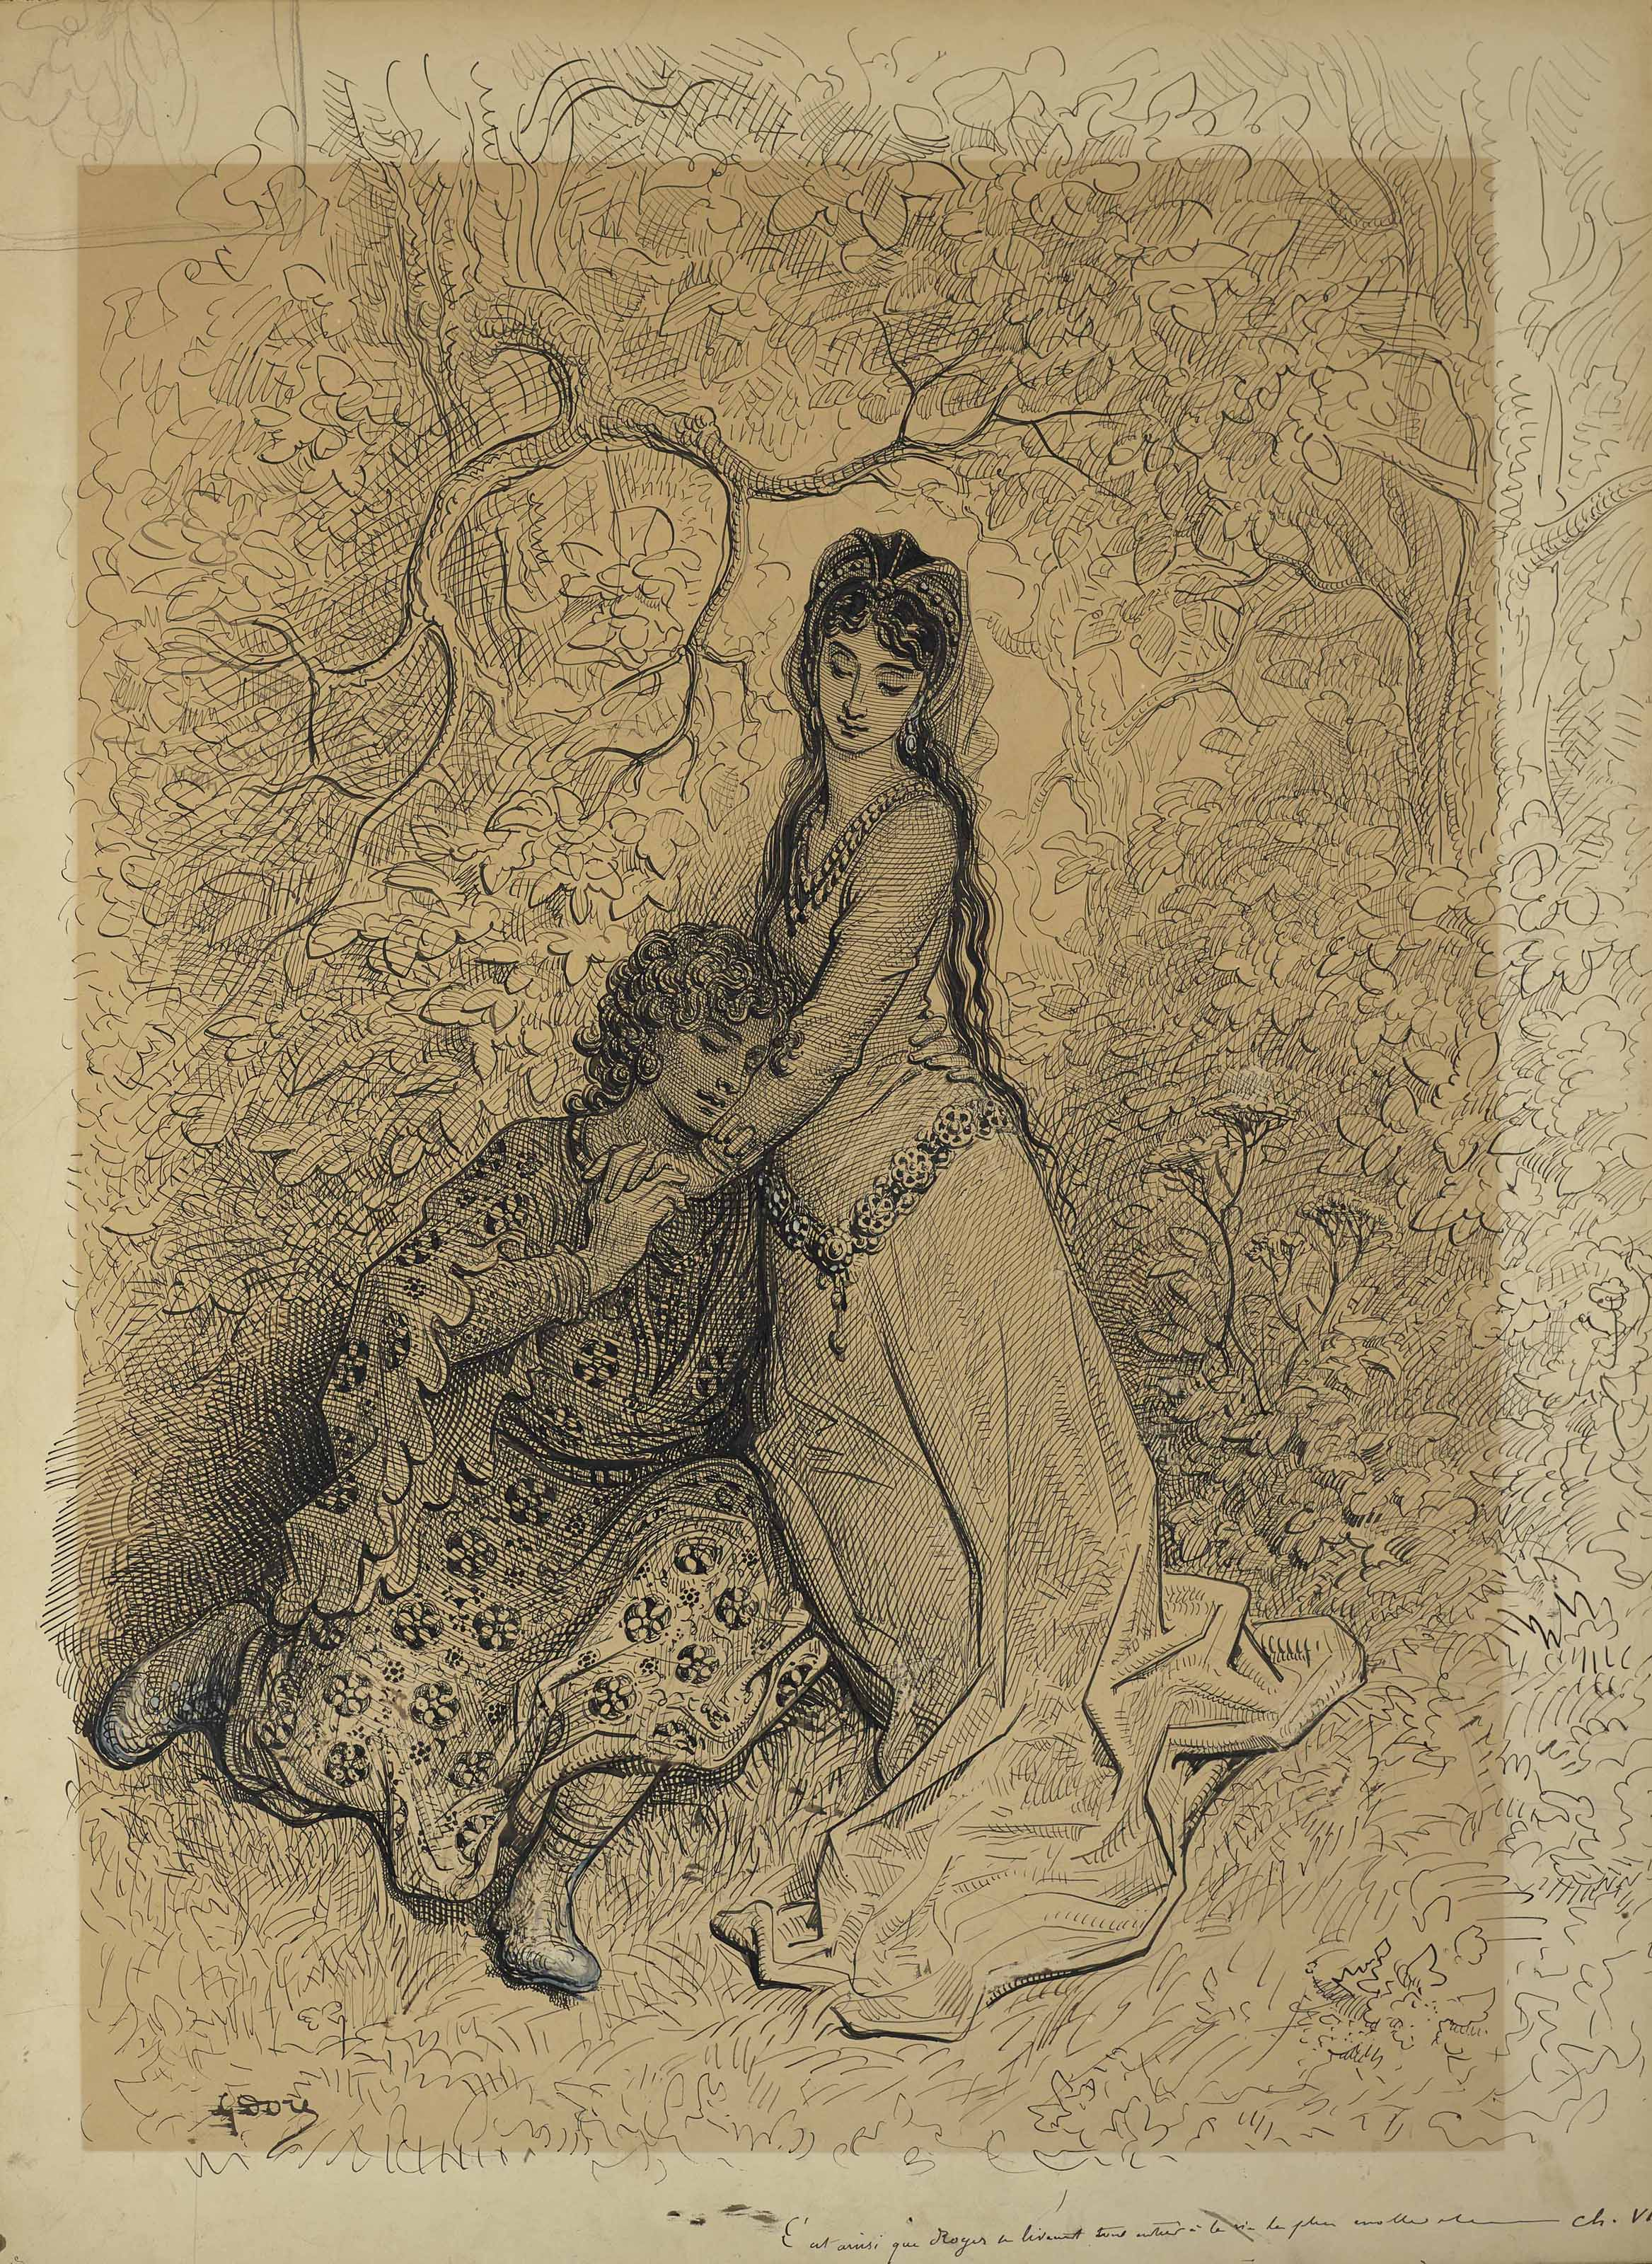 GUSTAVE DORÉ (STRASBOURG 1832-1883 PARIS)